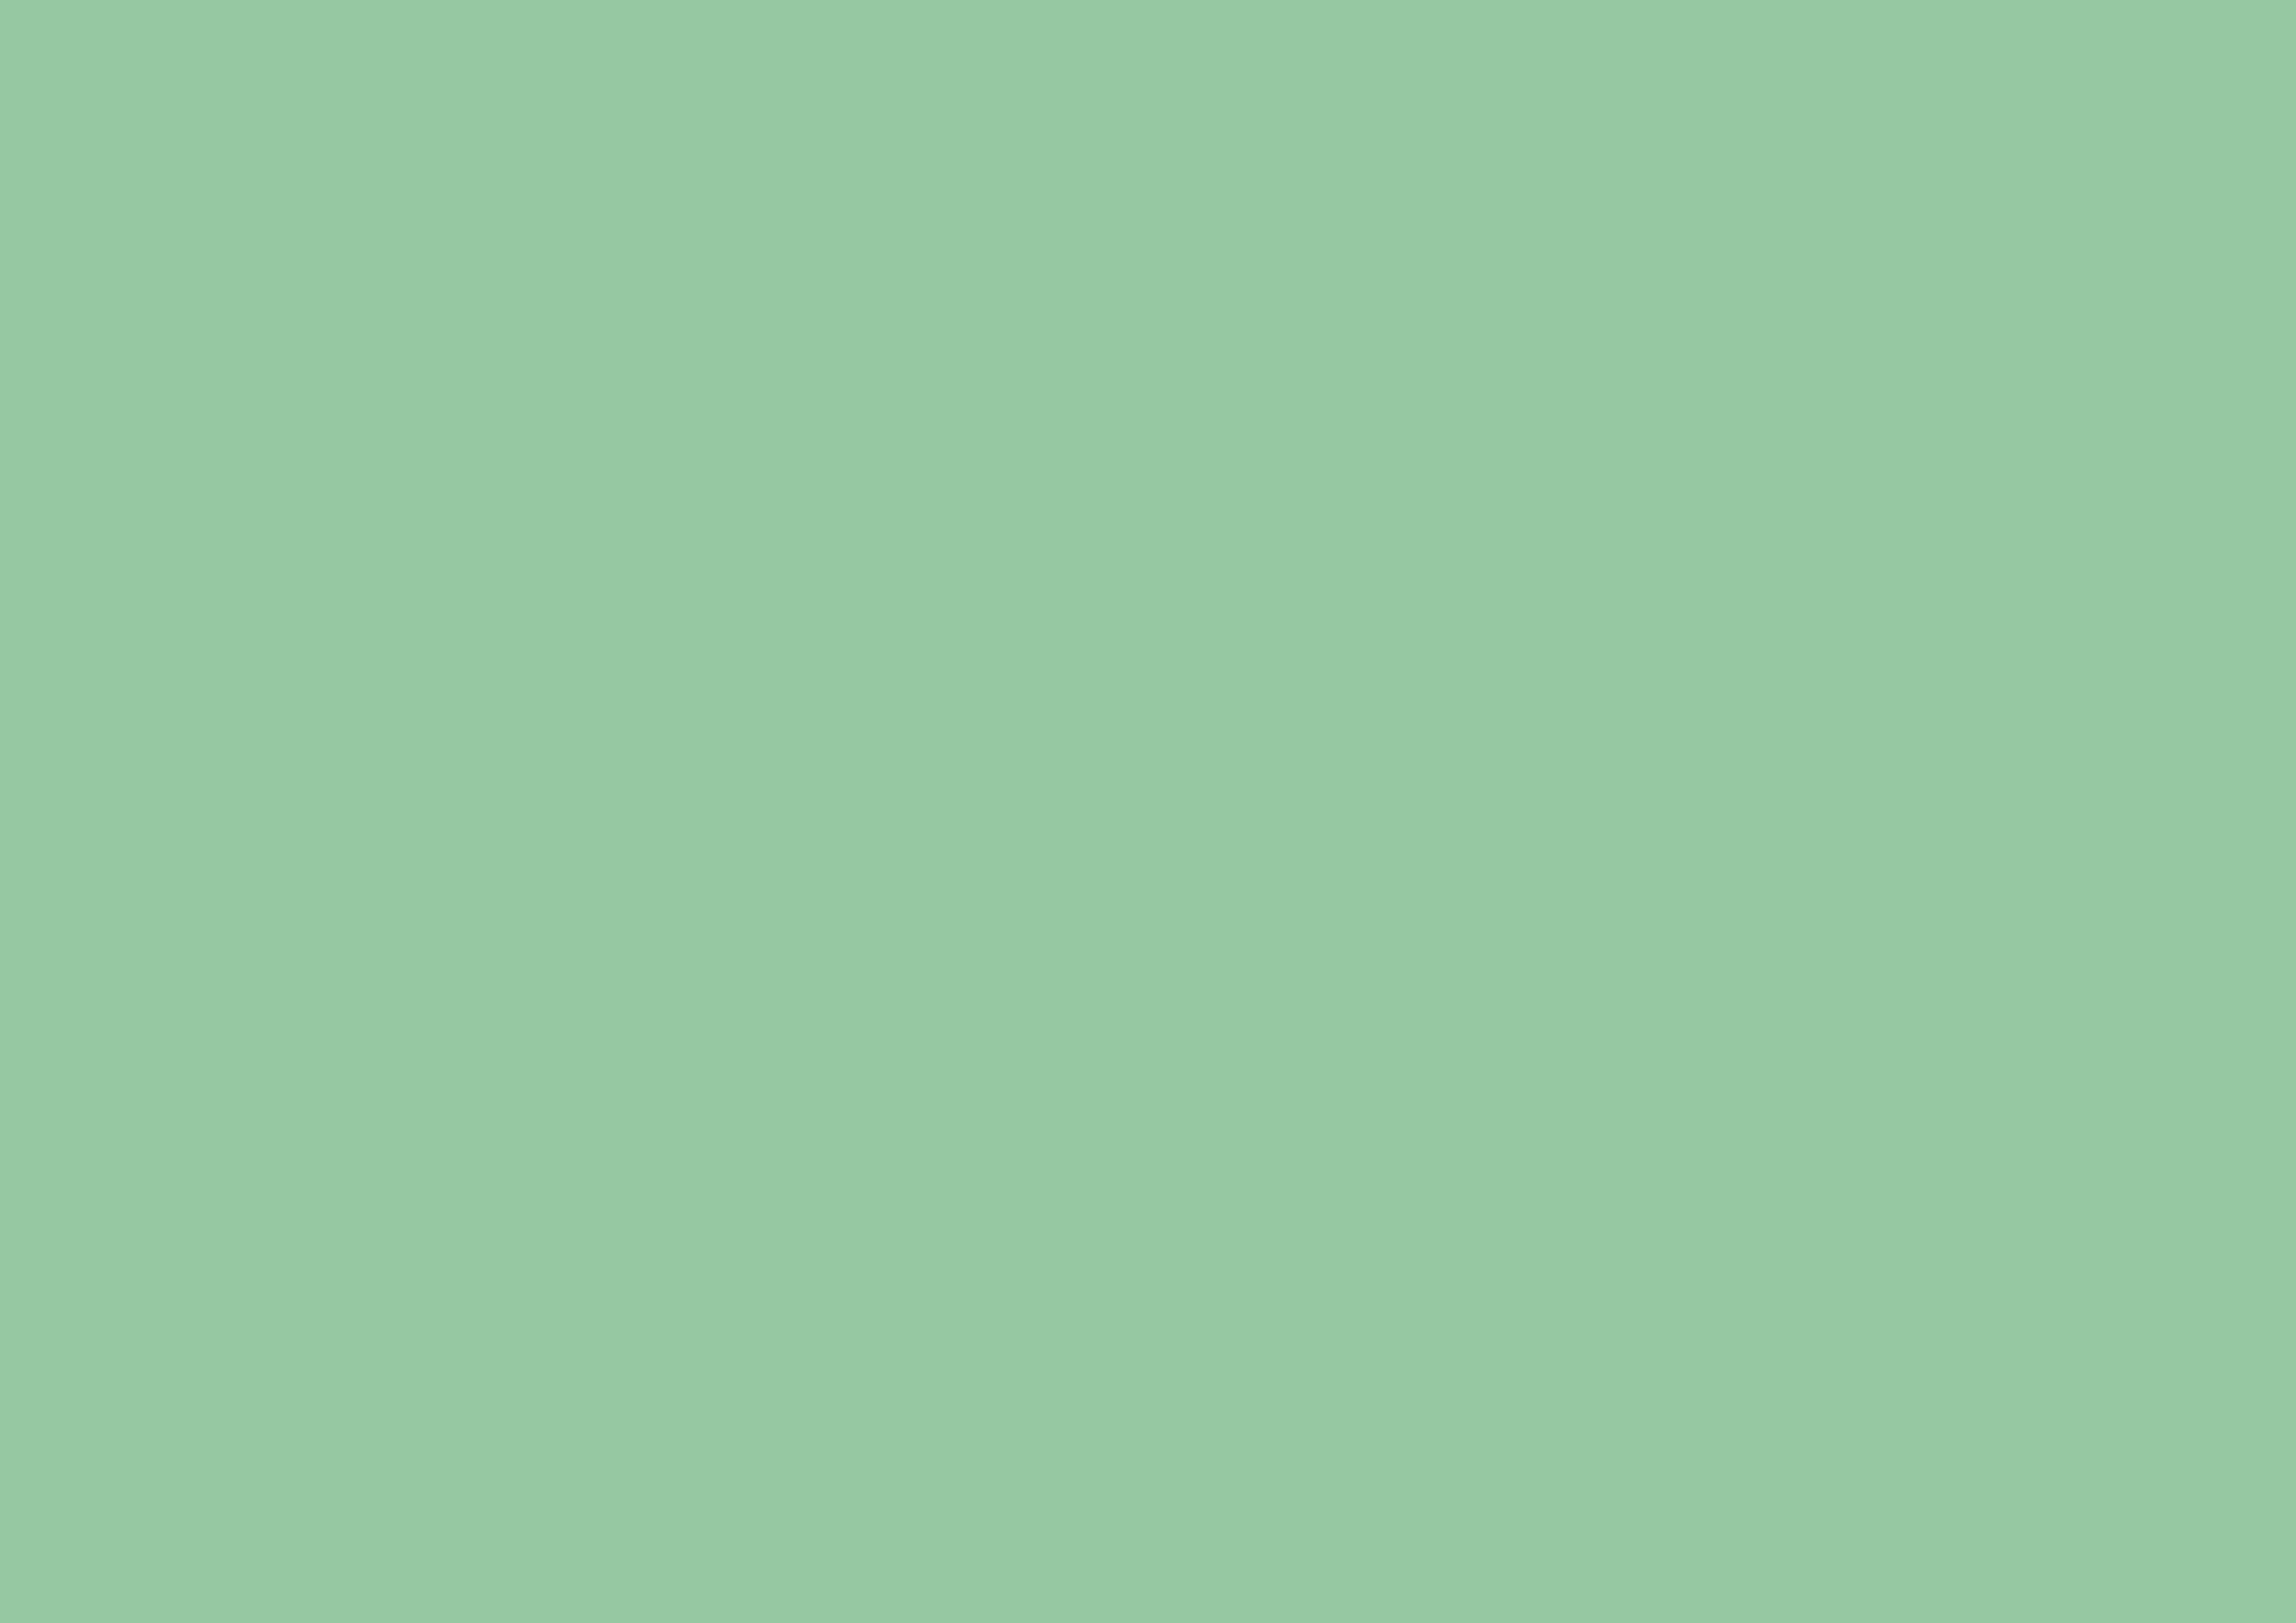 3508x2480 Eton Blue Solid Color Background